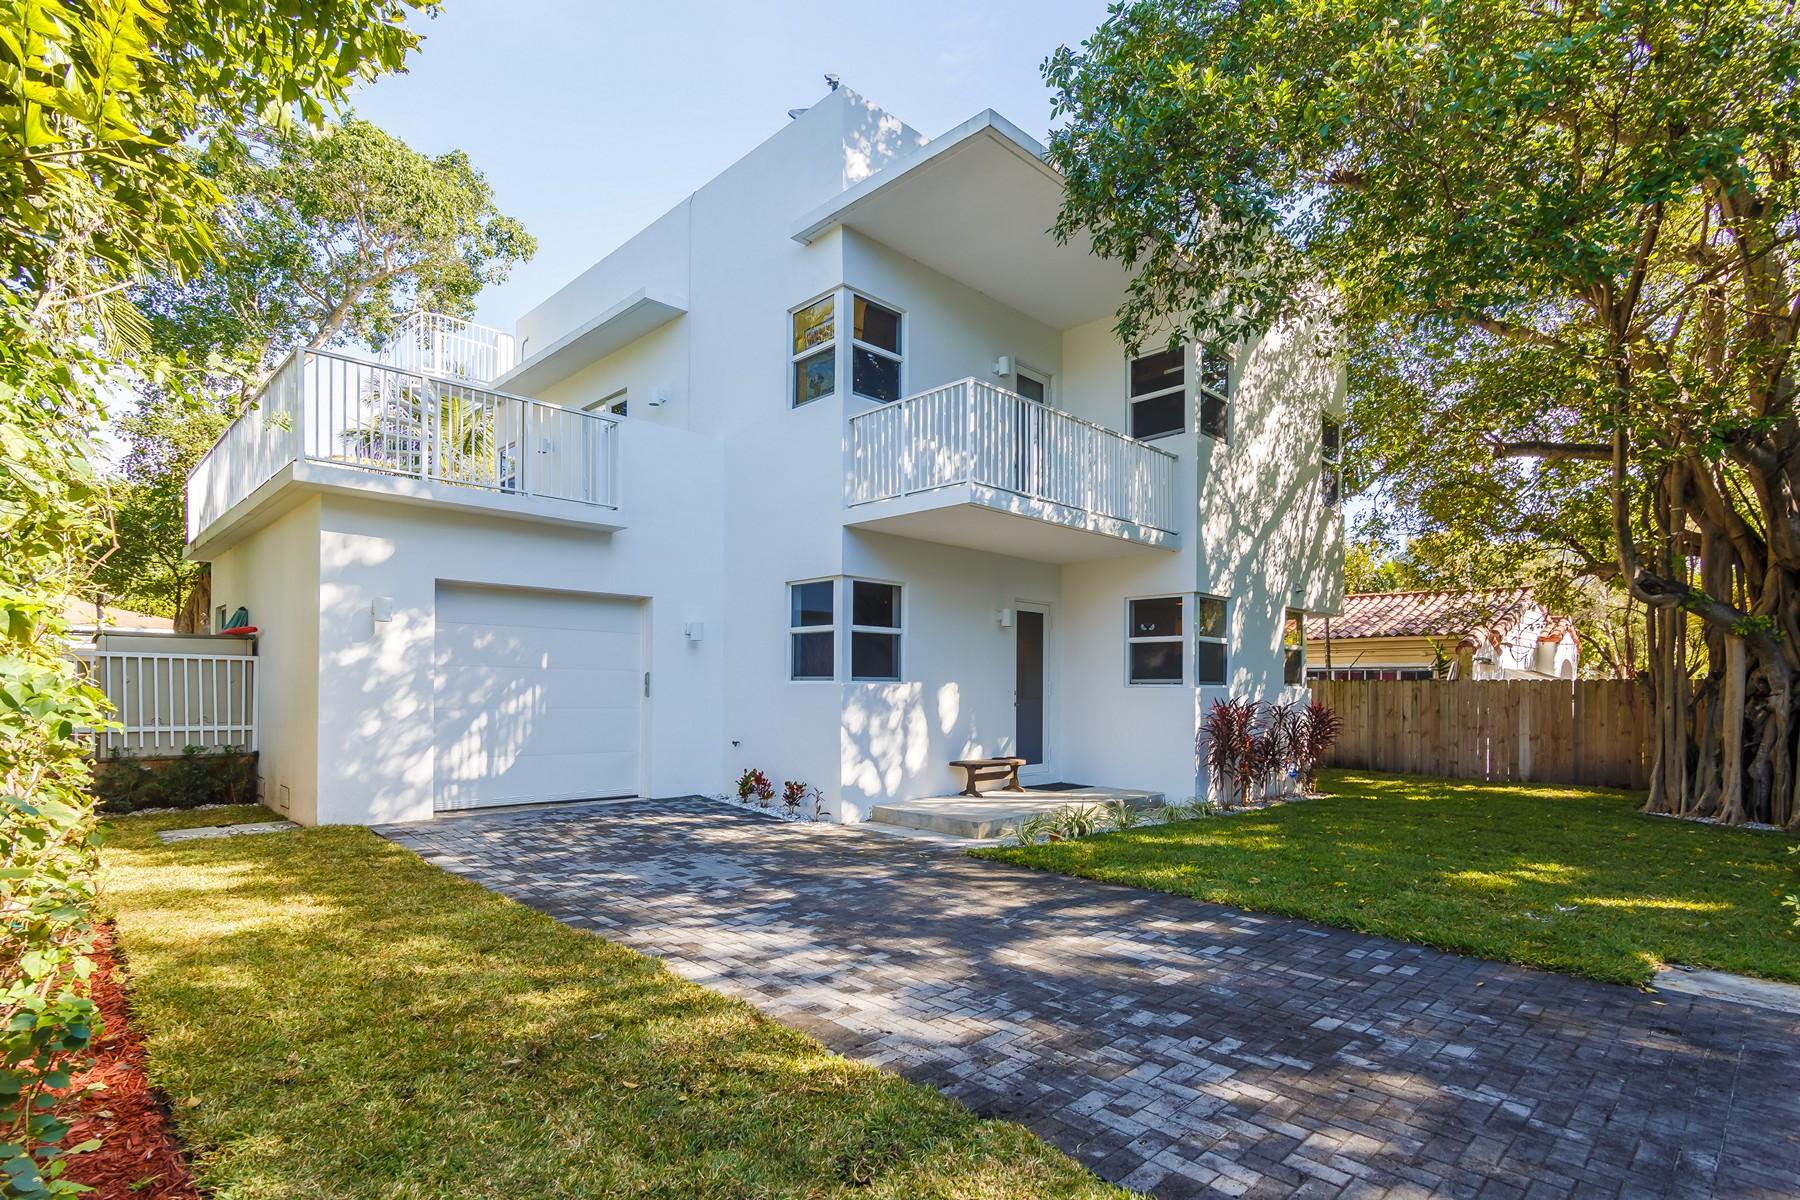 Single Family Home for Sale at 795 NE 70 Street 795 Ne 70th St Miami, Florida, 33138 United States